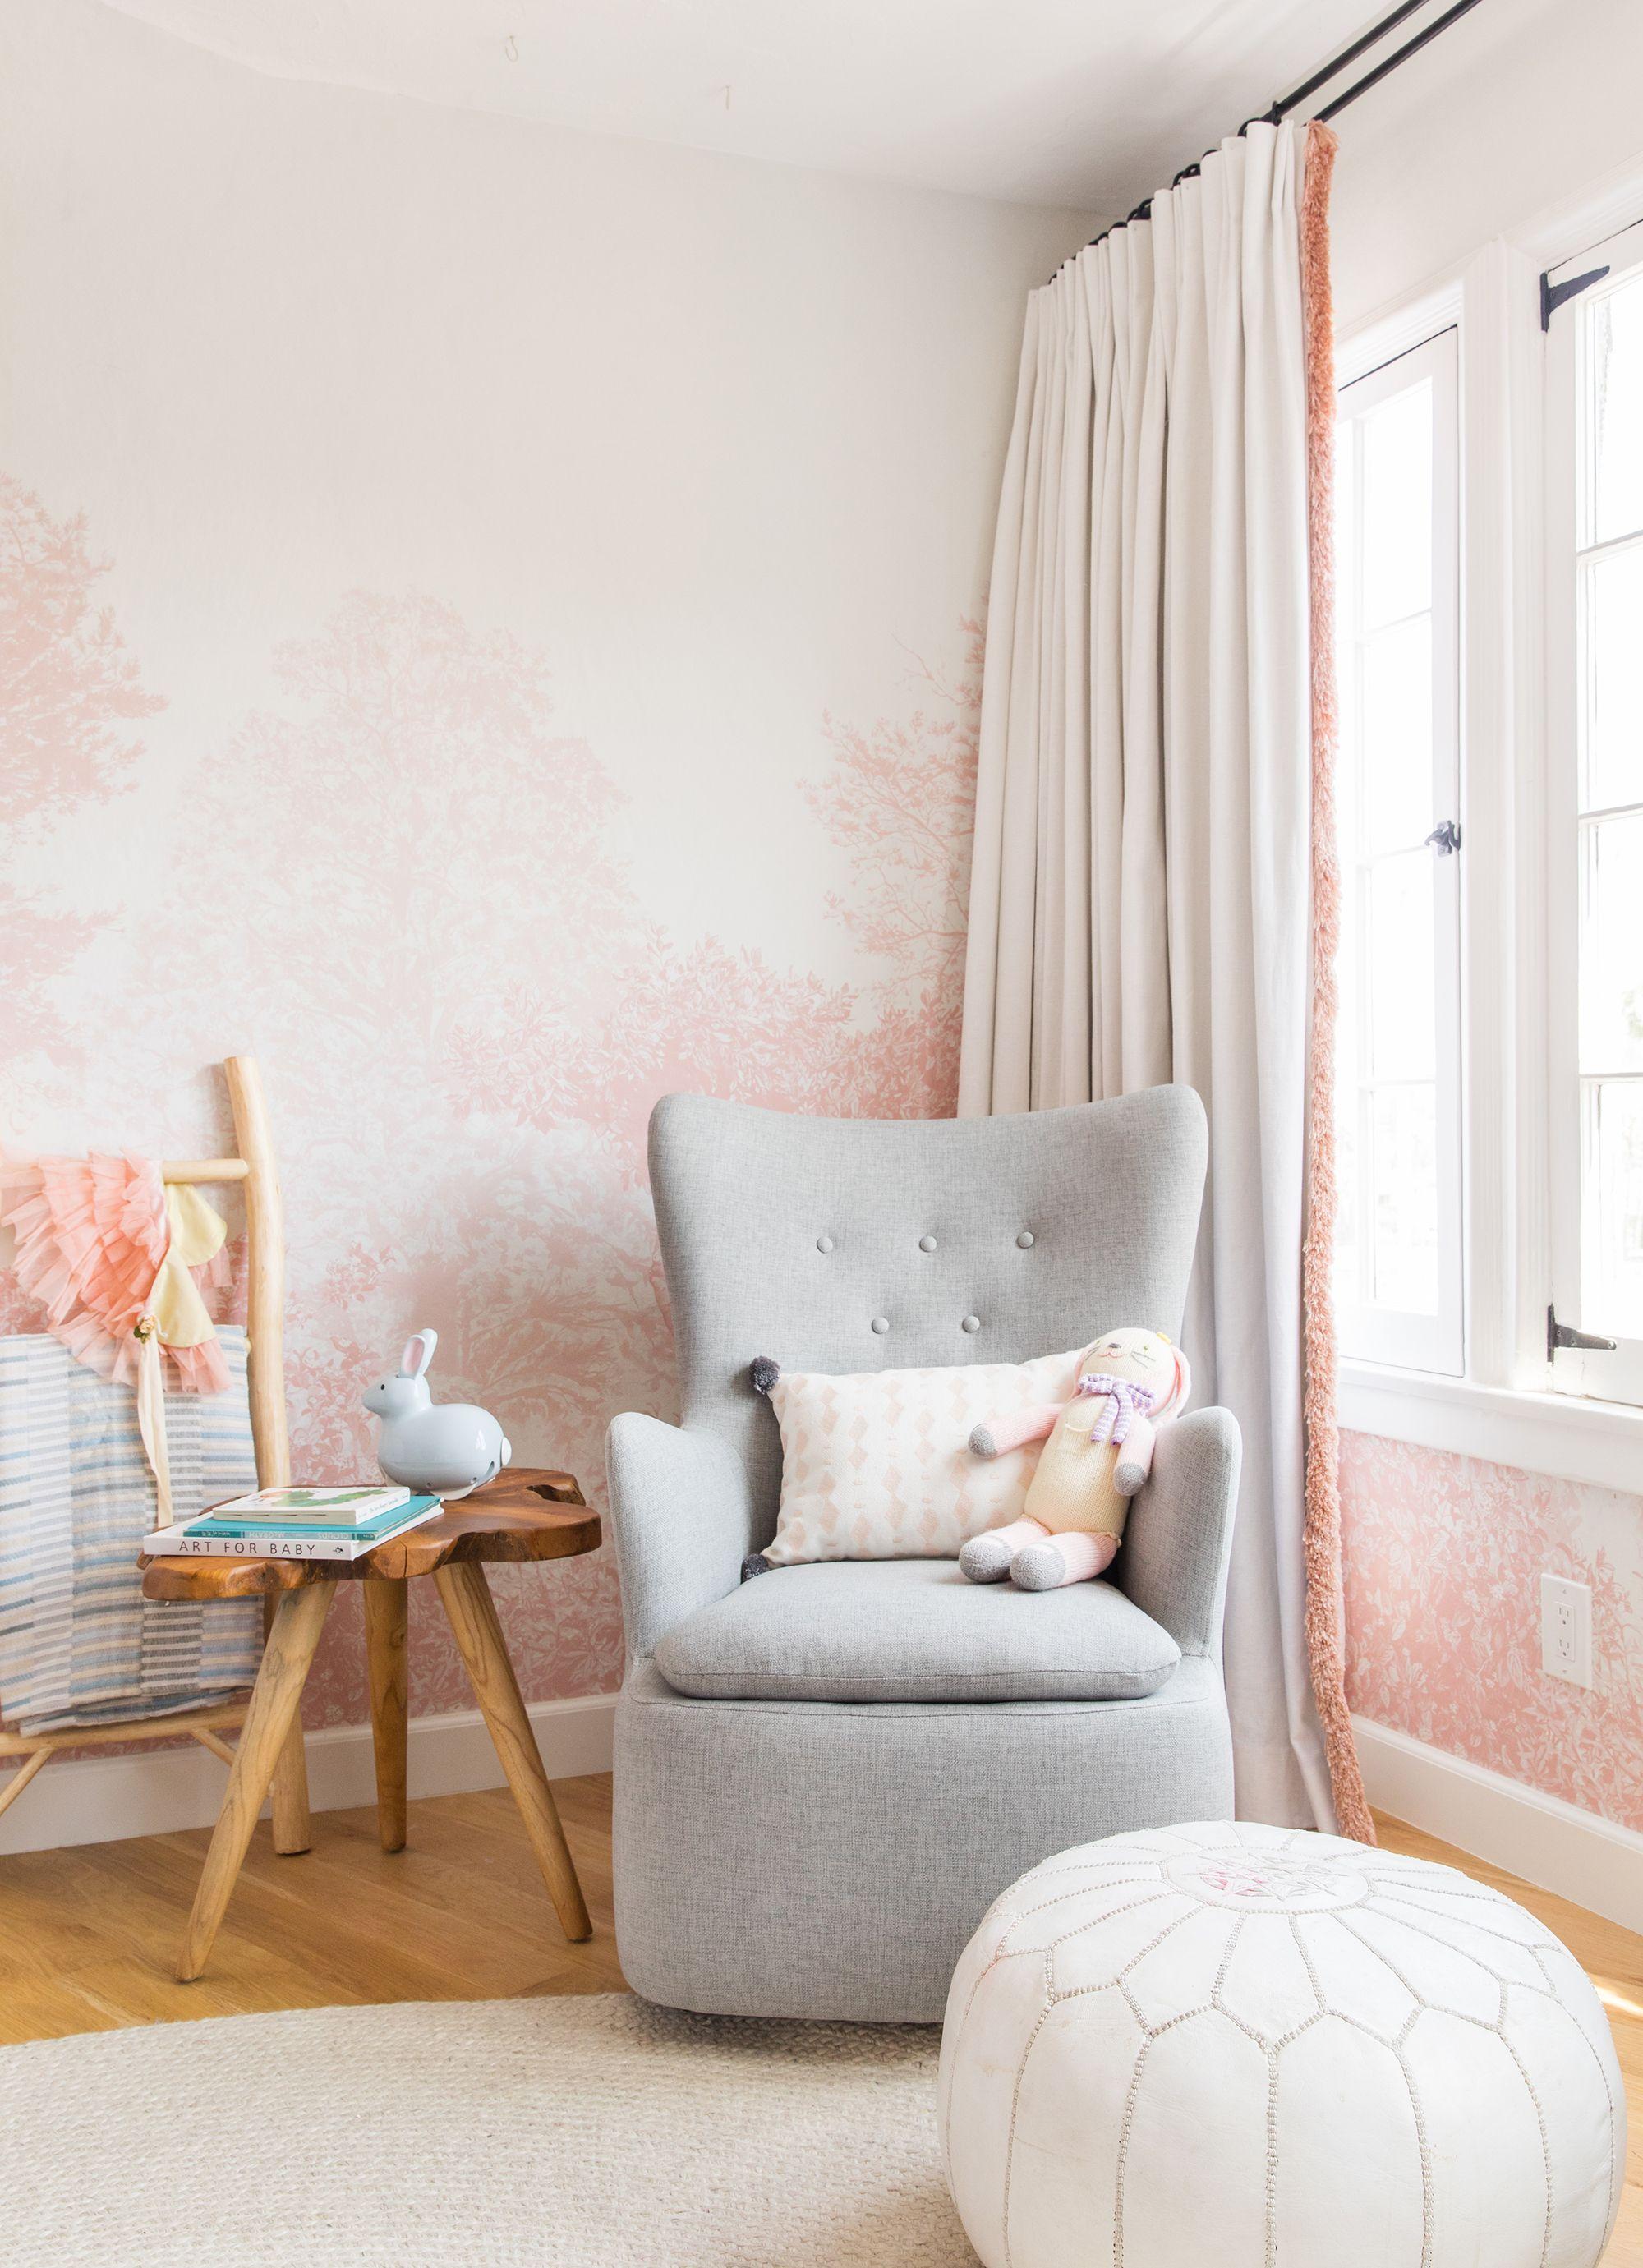 20 Cute Nursery Decorating Ideas - Baby Room Designs for ...